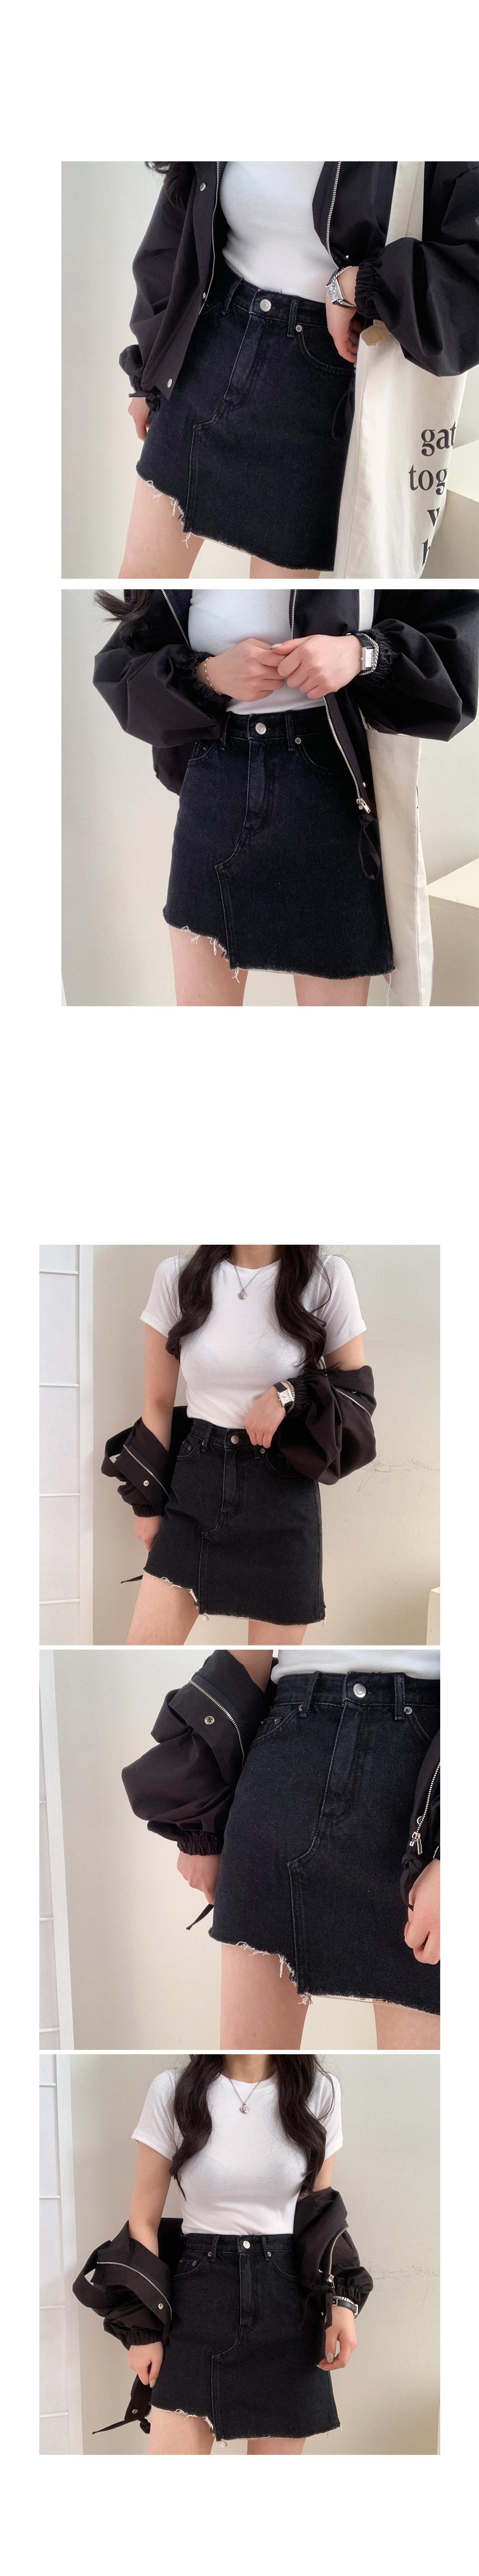 Black Unbal Denim Skirt